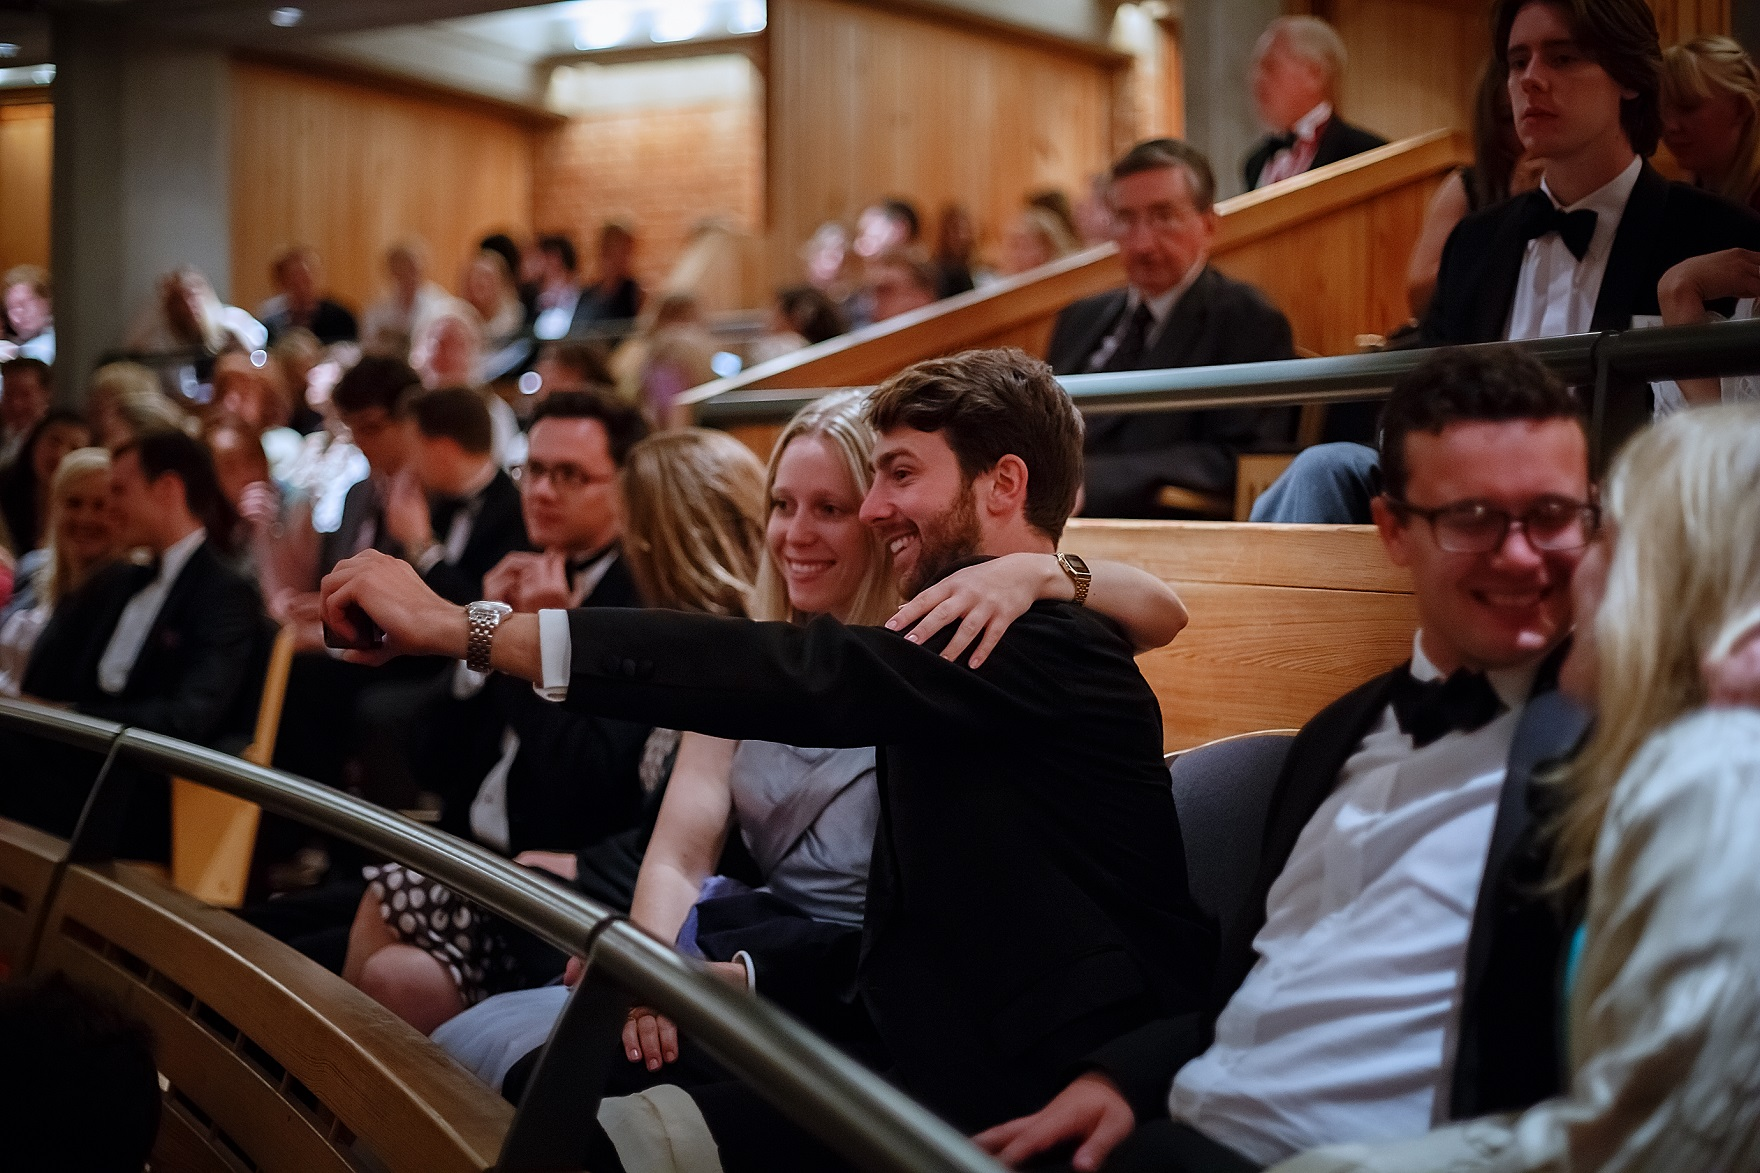 Glyndebourne-Festival-audience-in-the-auditorium_photographer-James-Bellorini